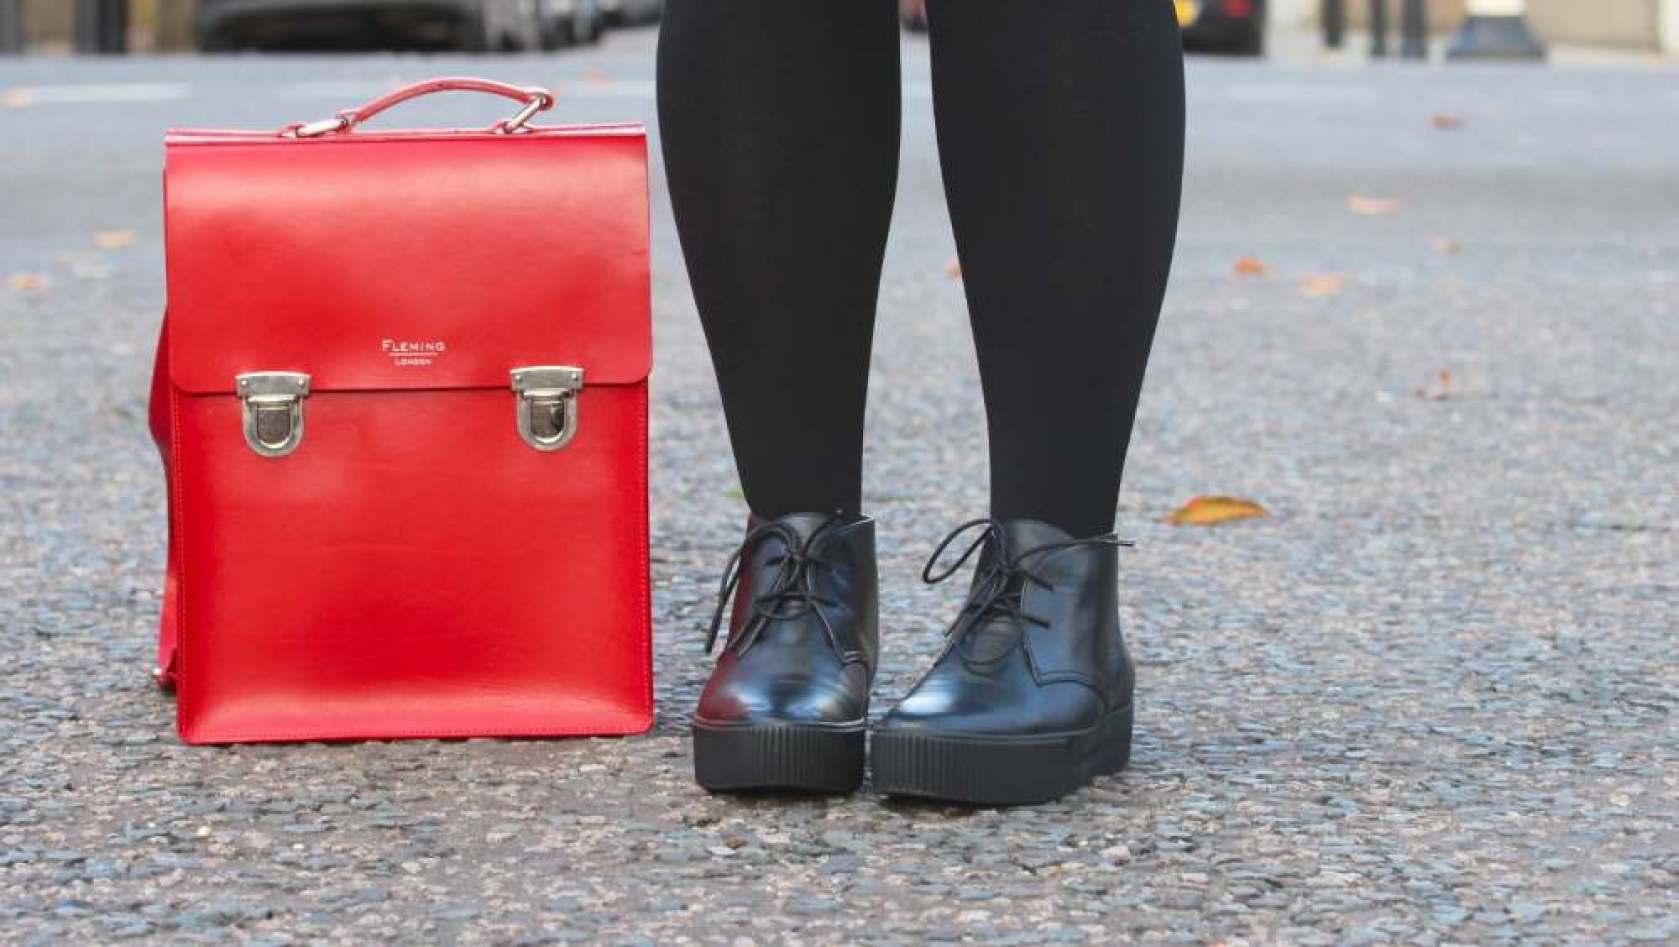 flemming london bag